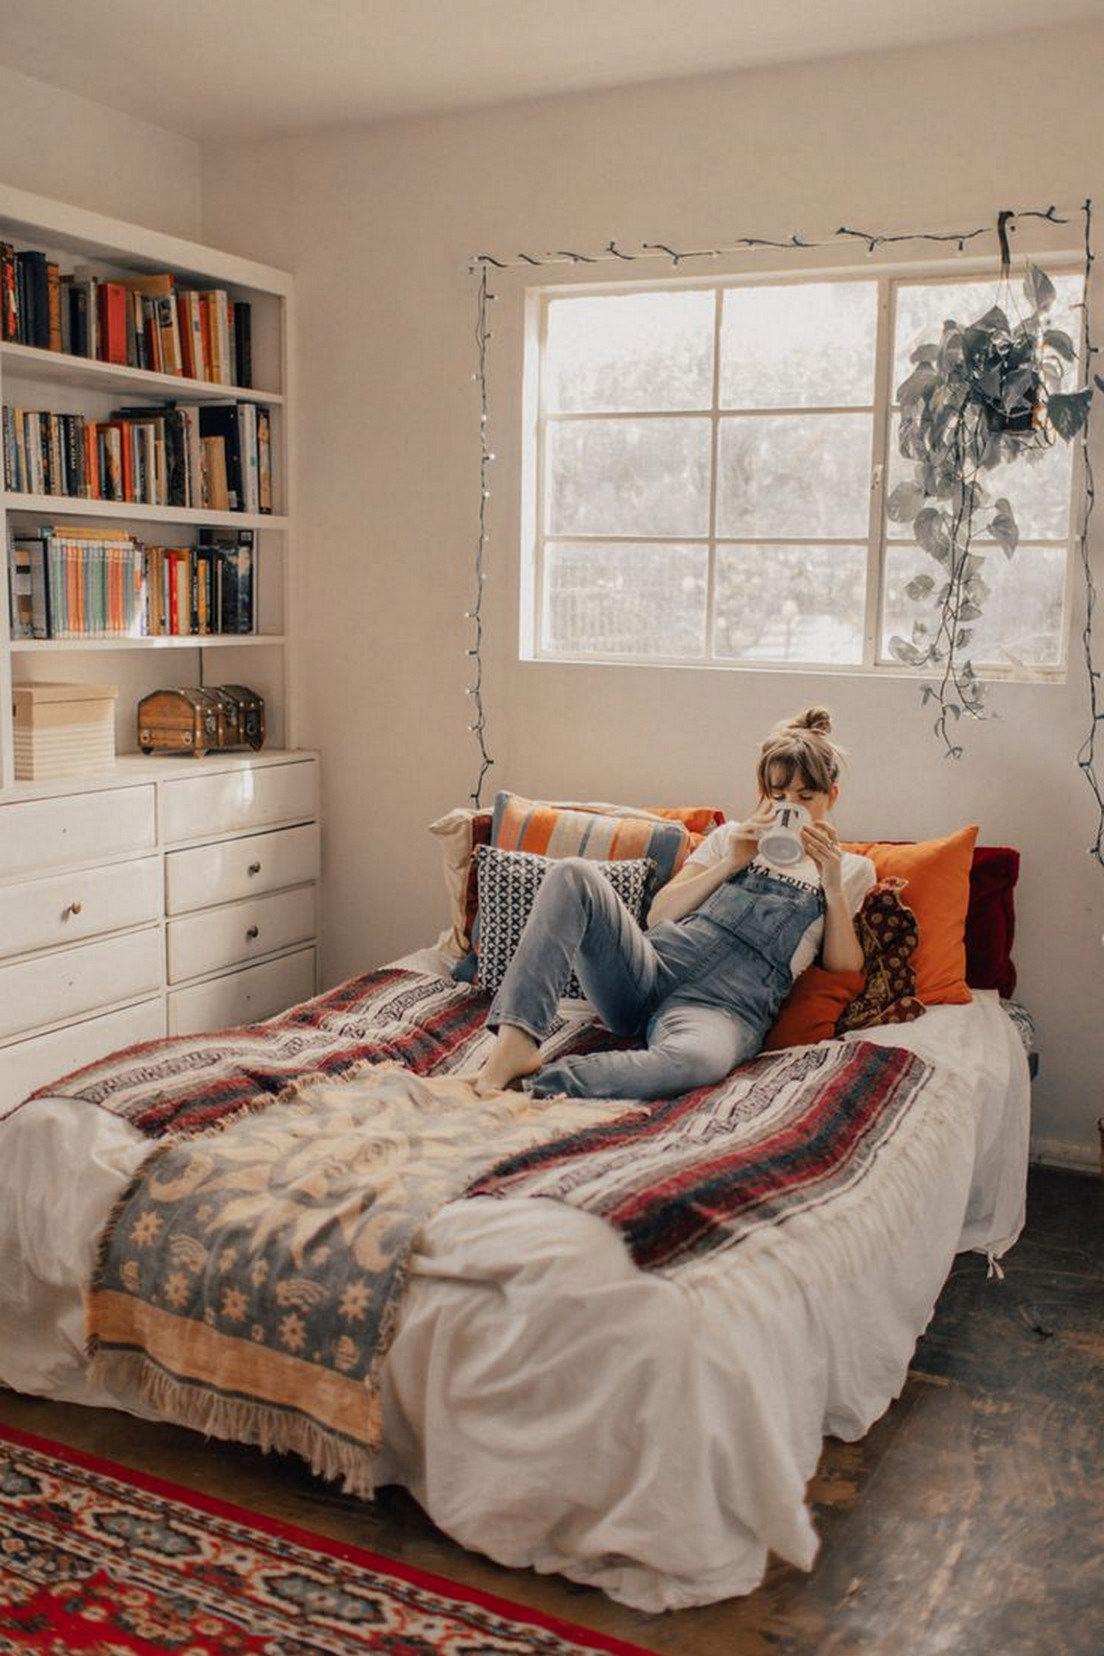 30 Rustic Bedroom Ideas For Creative People 58 Fieltro Net Bedroom Decor Cozy Cozy Small Bedrooms Bedroom Ideas Pinterest